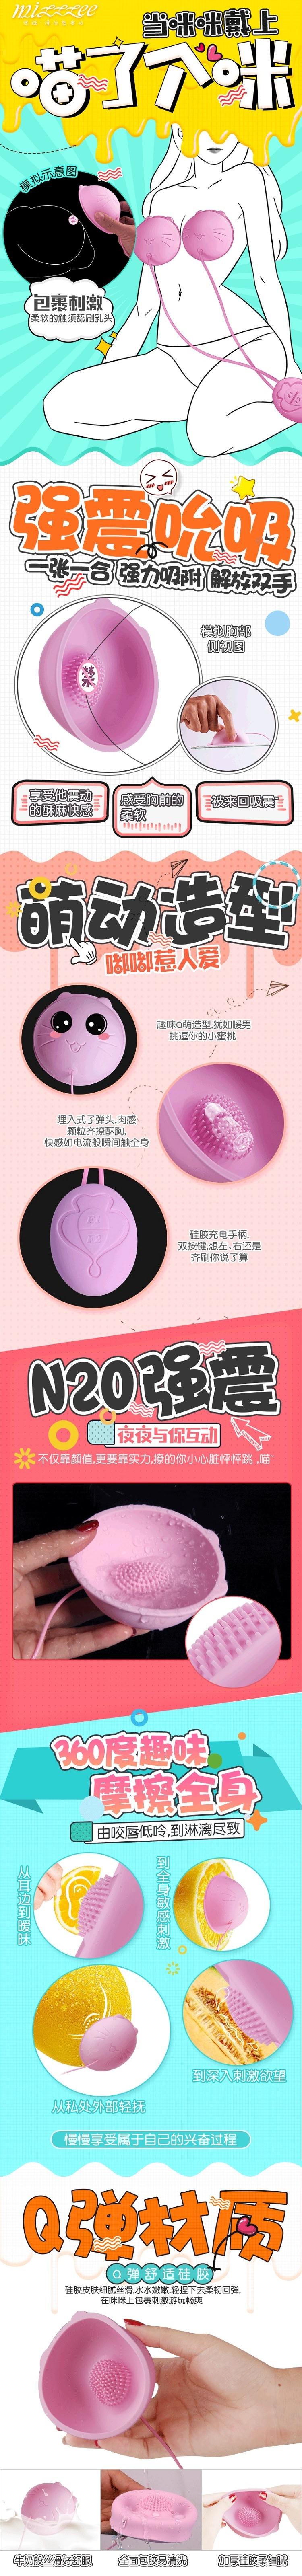 MZ016B Breast Vibrator